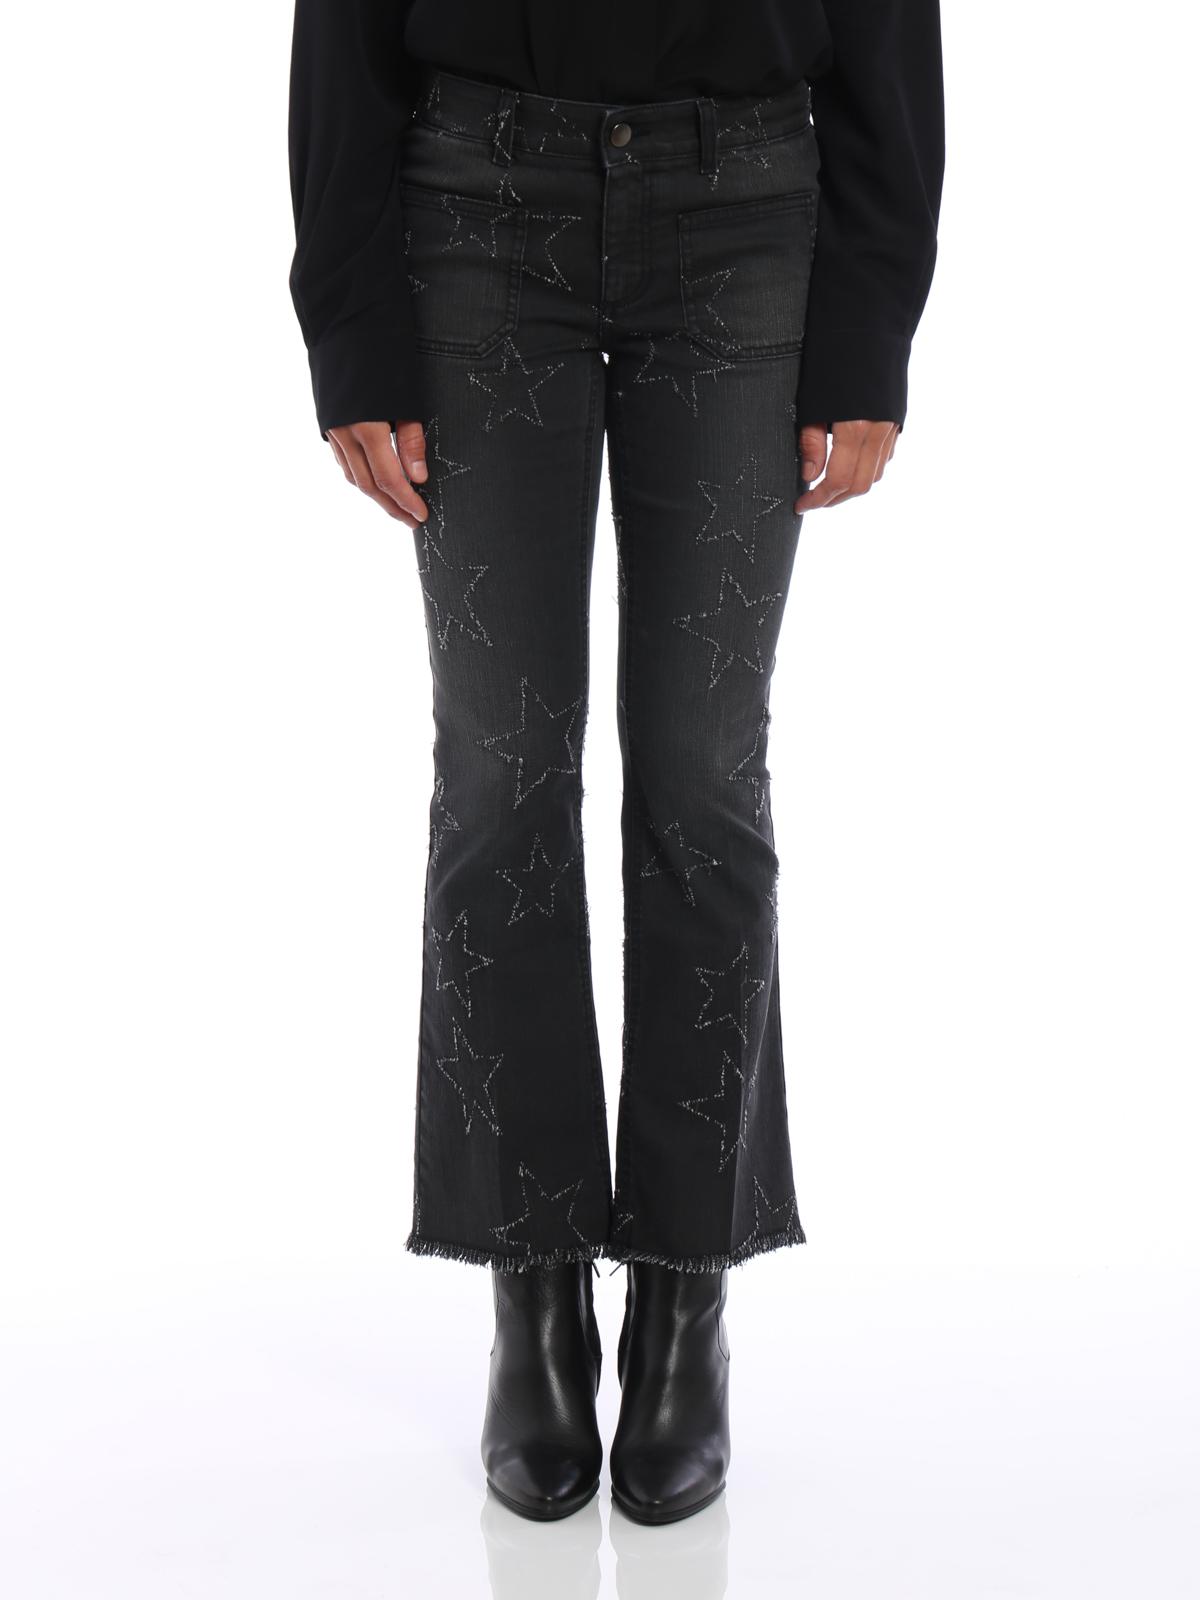 Stelle Zampa Mccartney Stella Crop Con A Jeans 7gYyvb6f